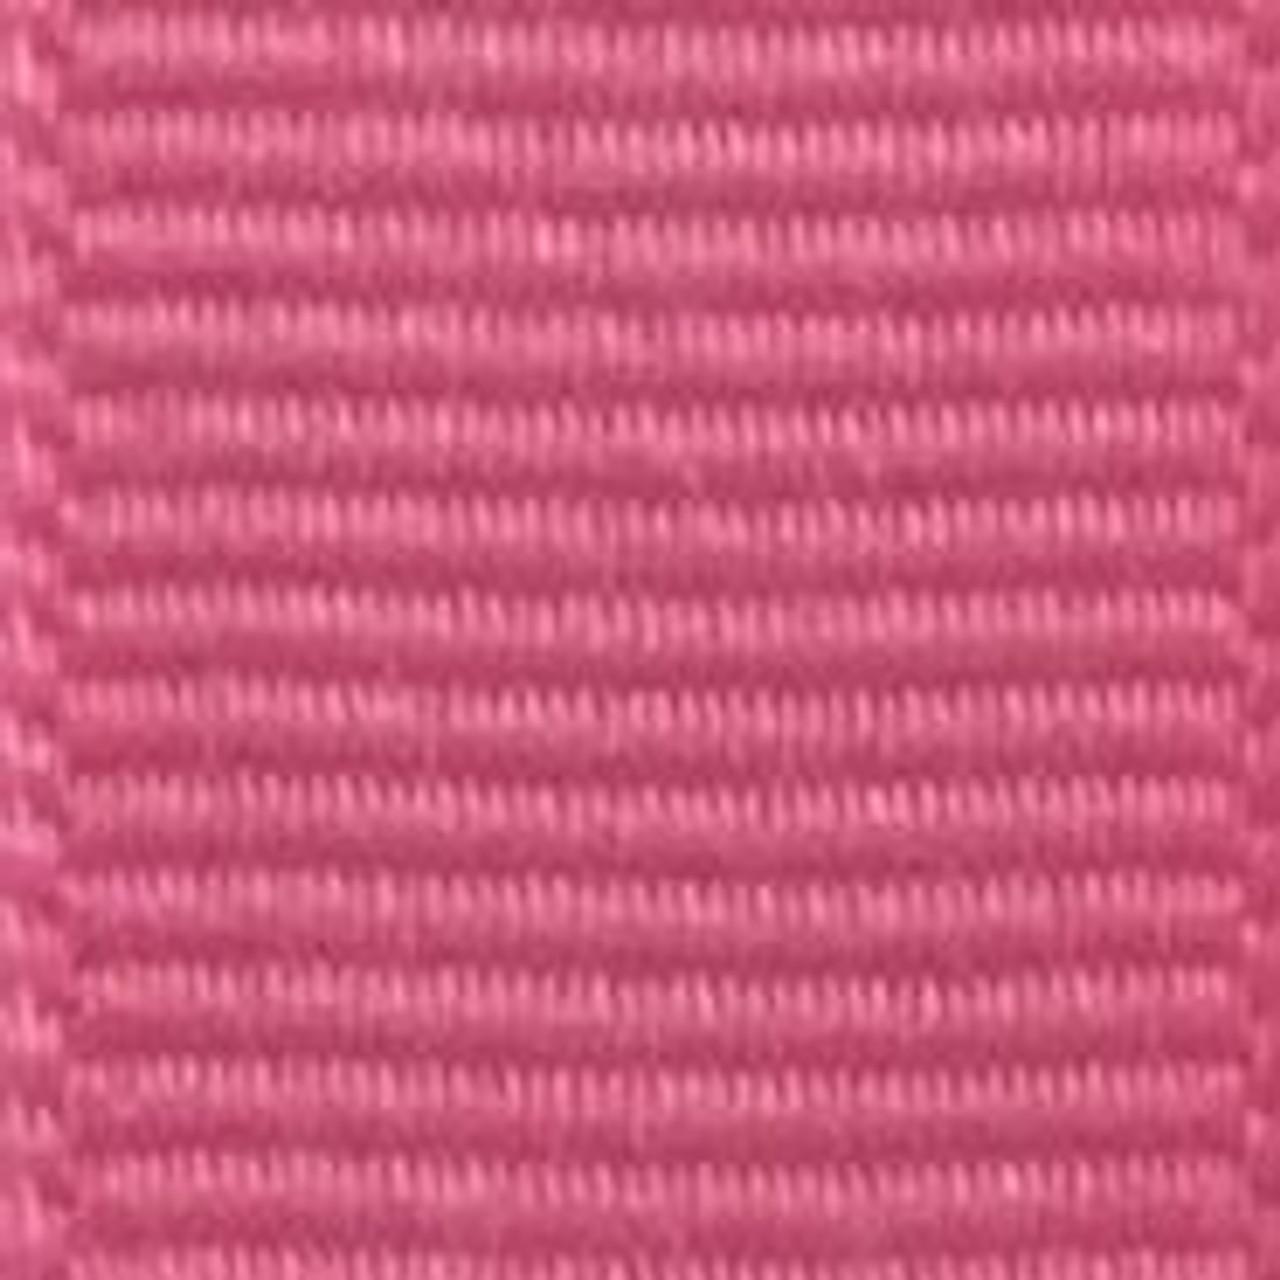 Hot Pink Solid Grosgrain Ribbon